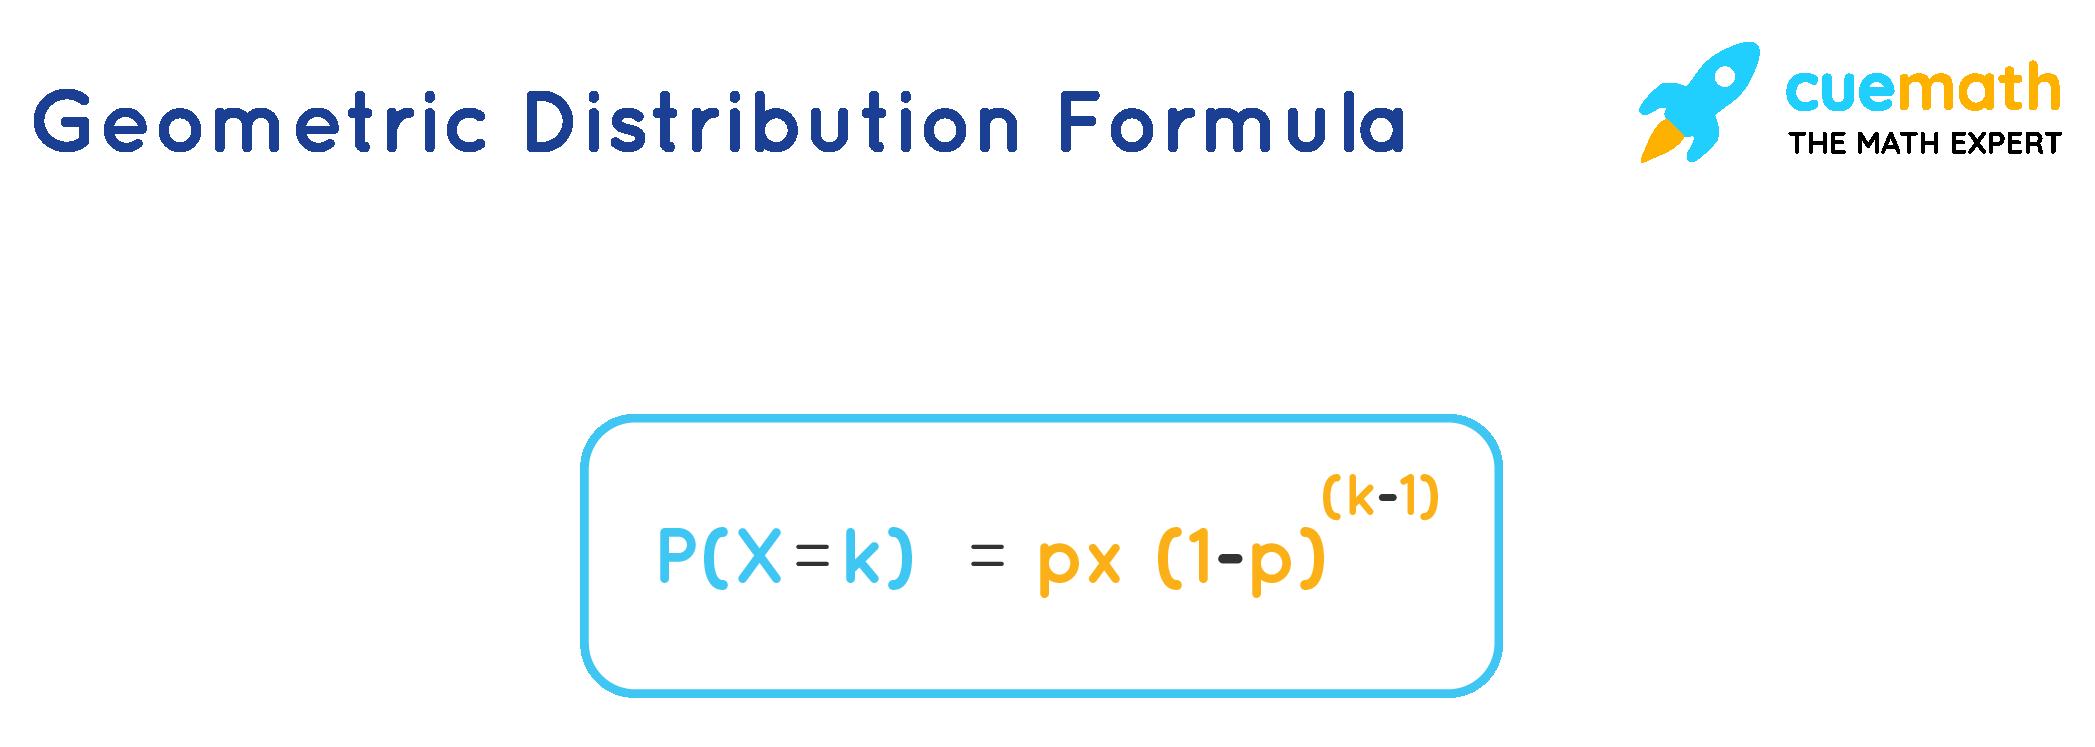 Geometric Distribution Formula